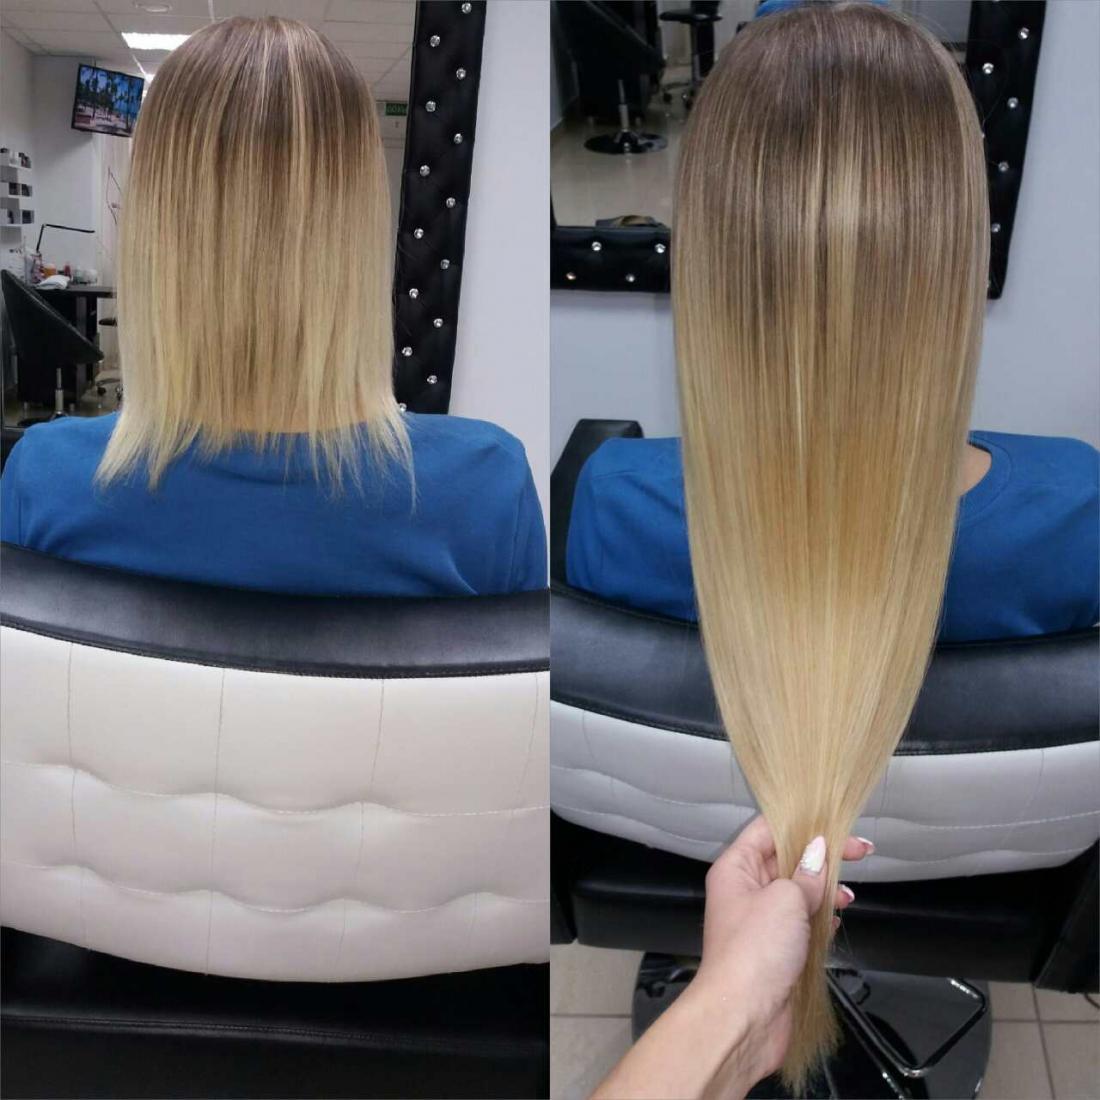 Наращивание волос, коррекция волос, снятие от 380 руб.